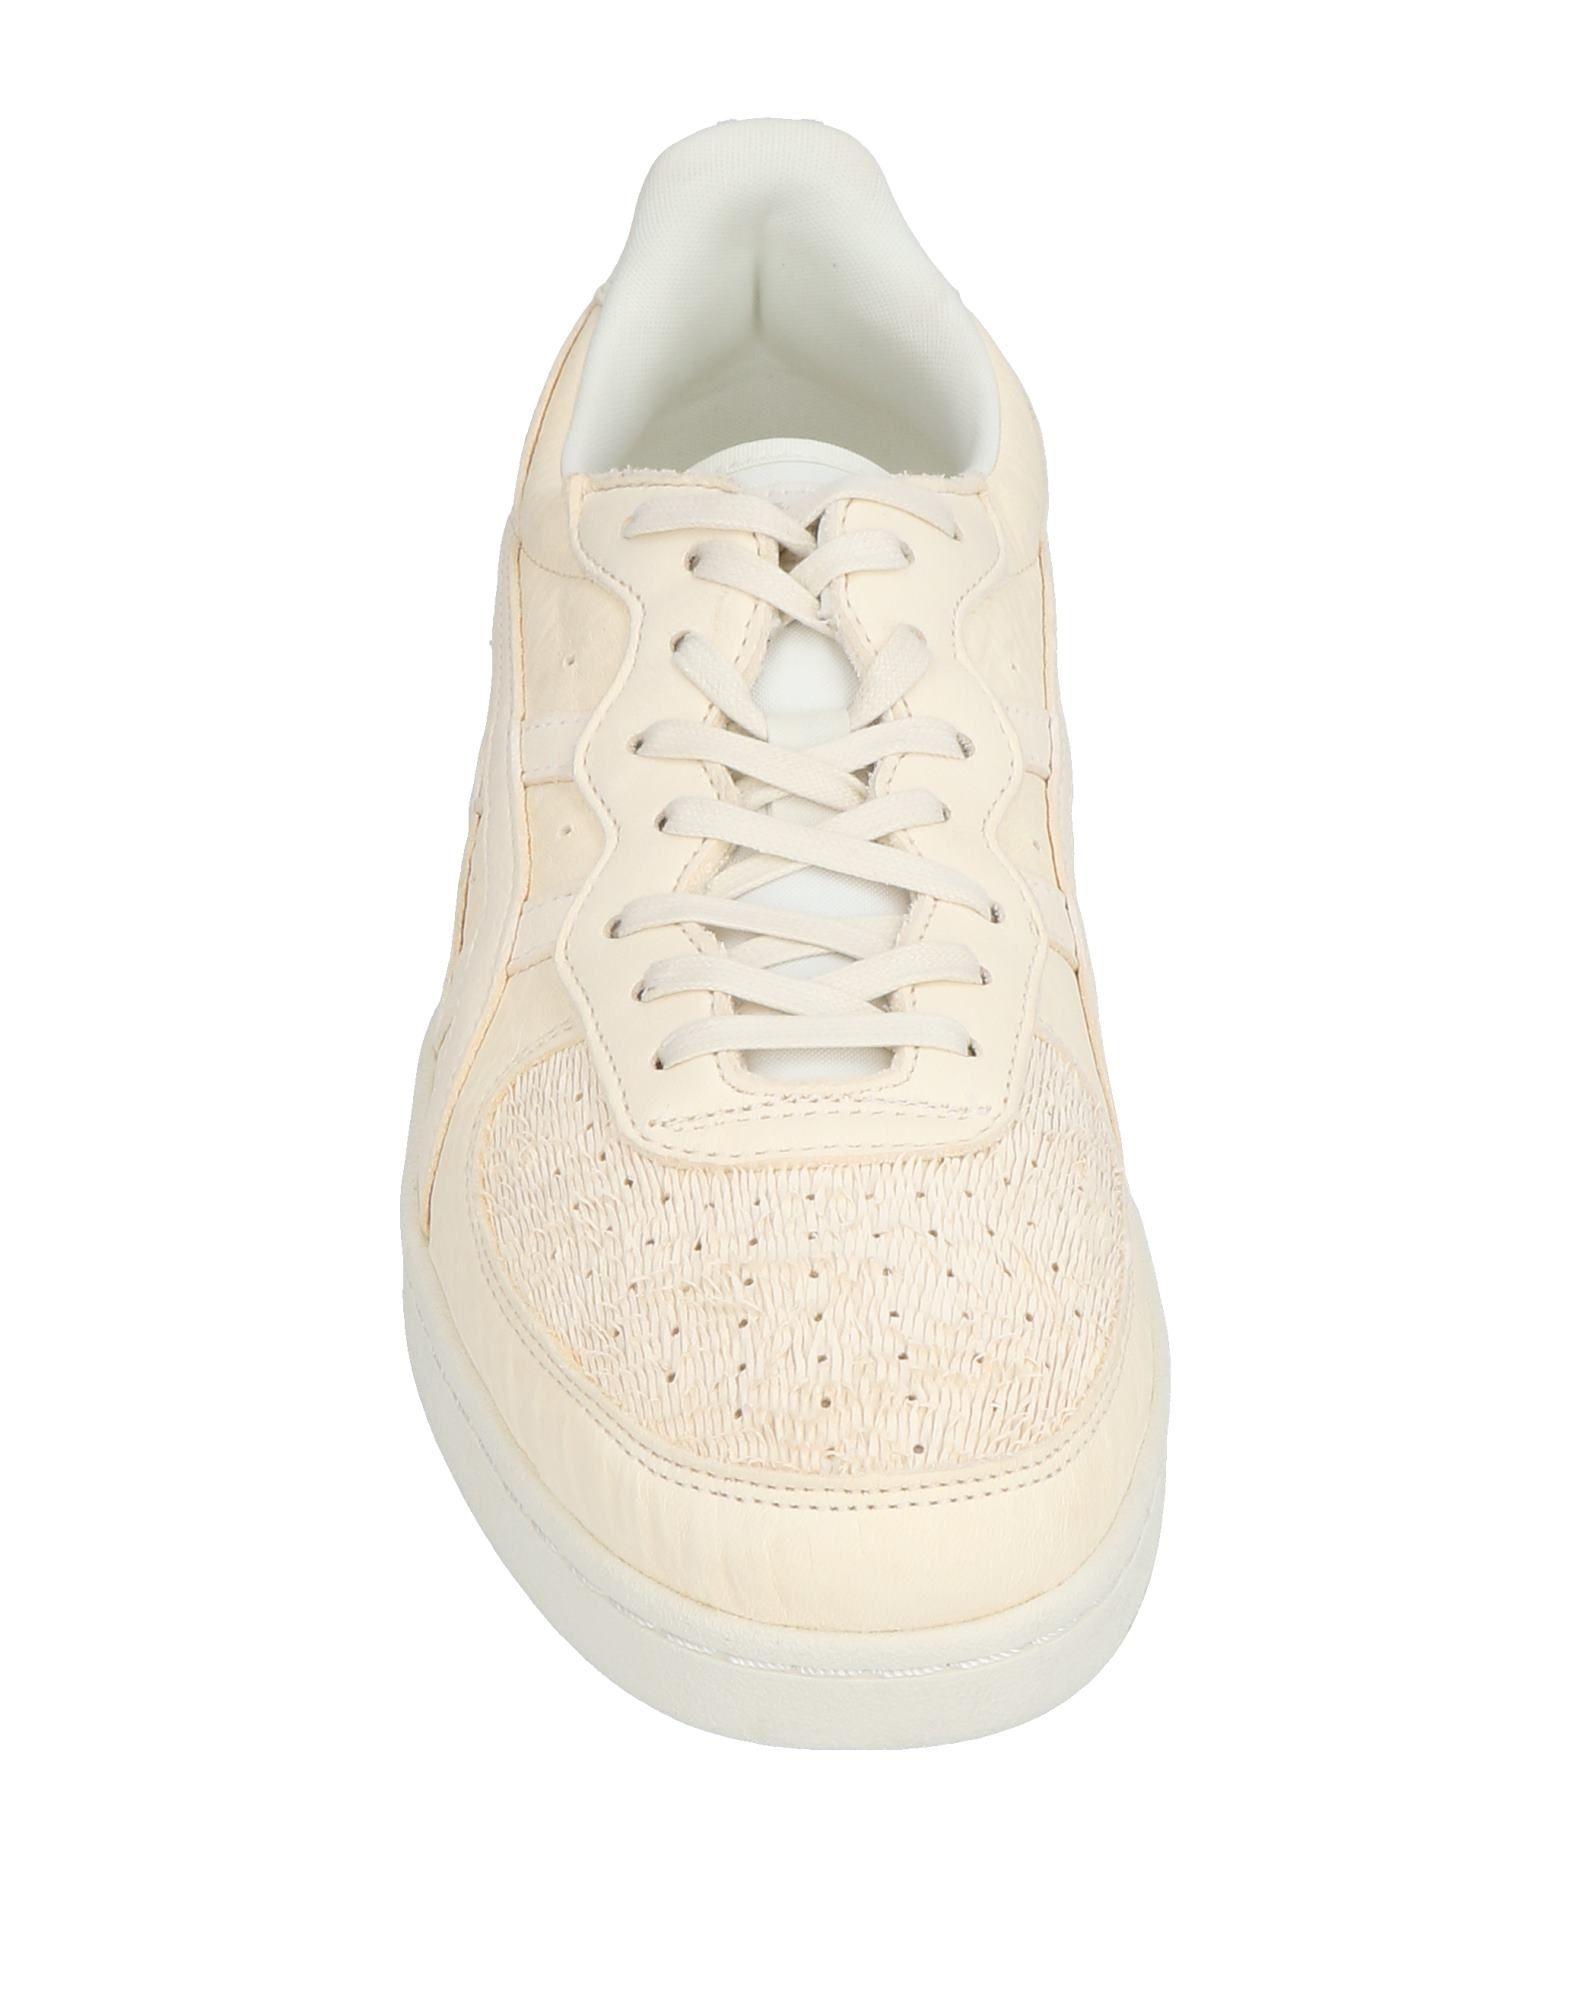 Rabatt echte Herren Schuhe Onitsuka Tiger Sneakers Herren echte  11497629GN 5f830e